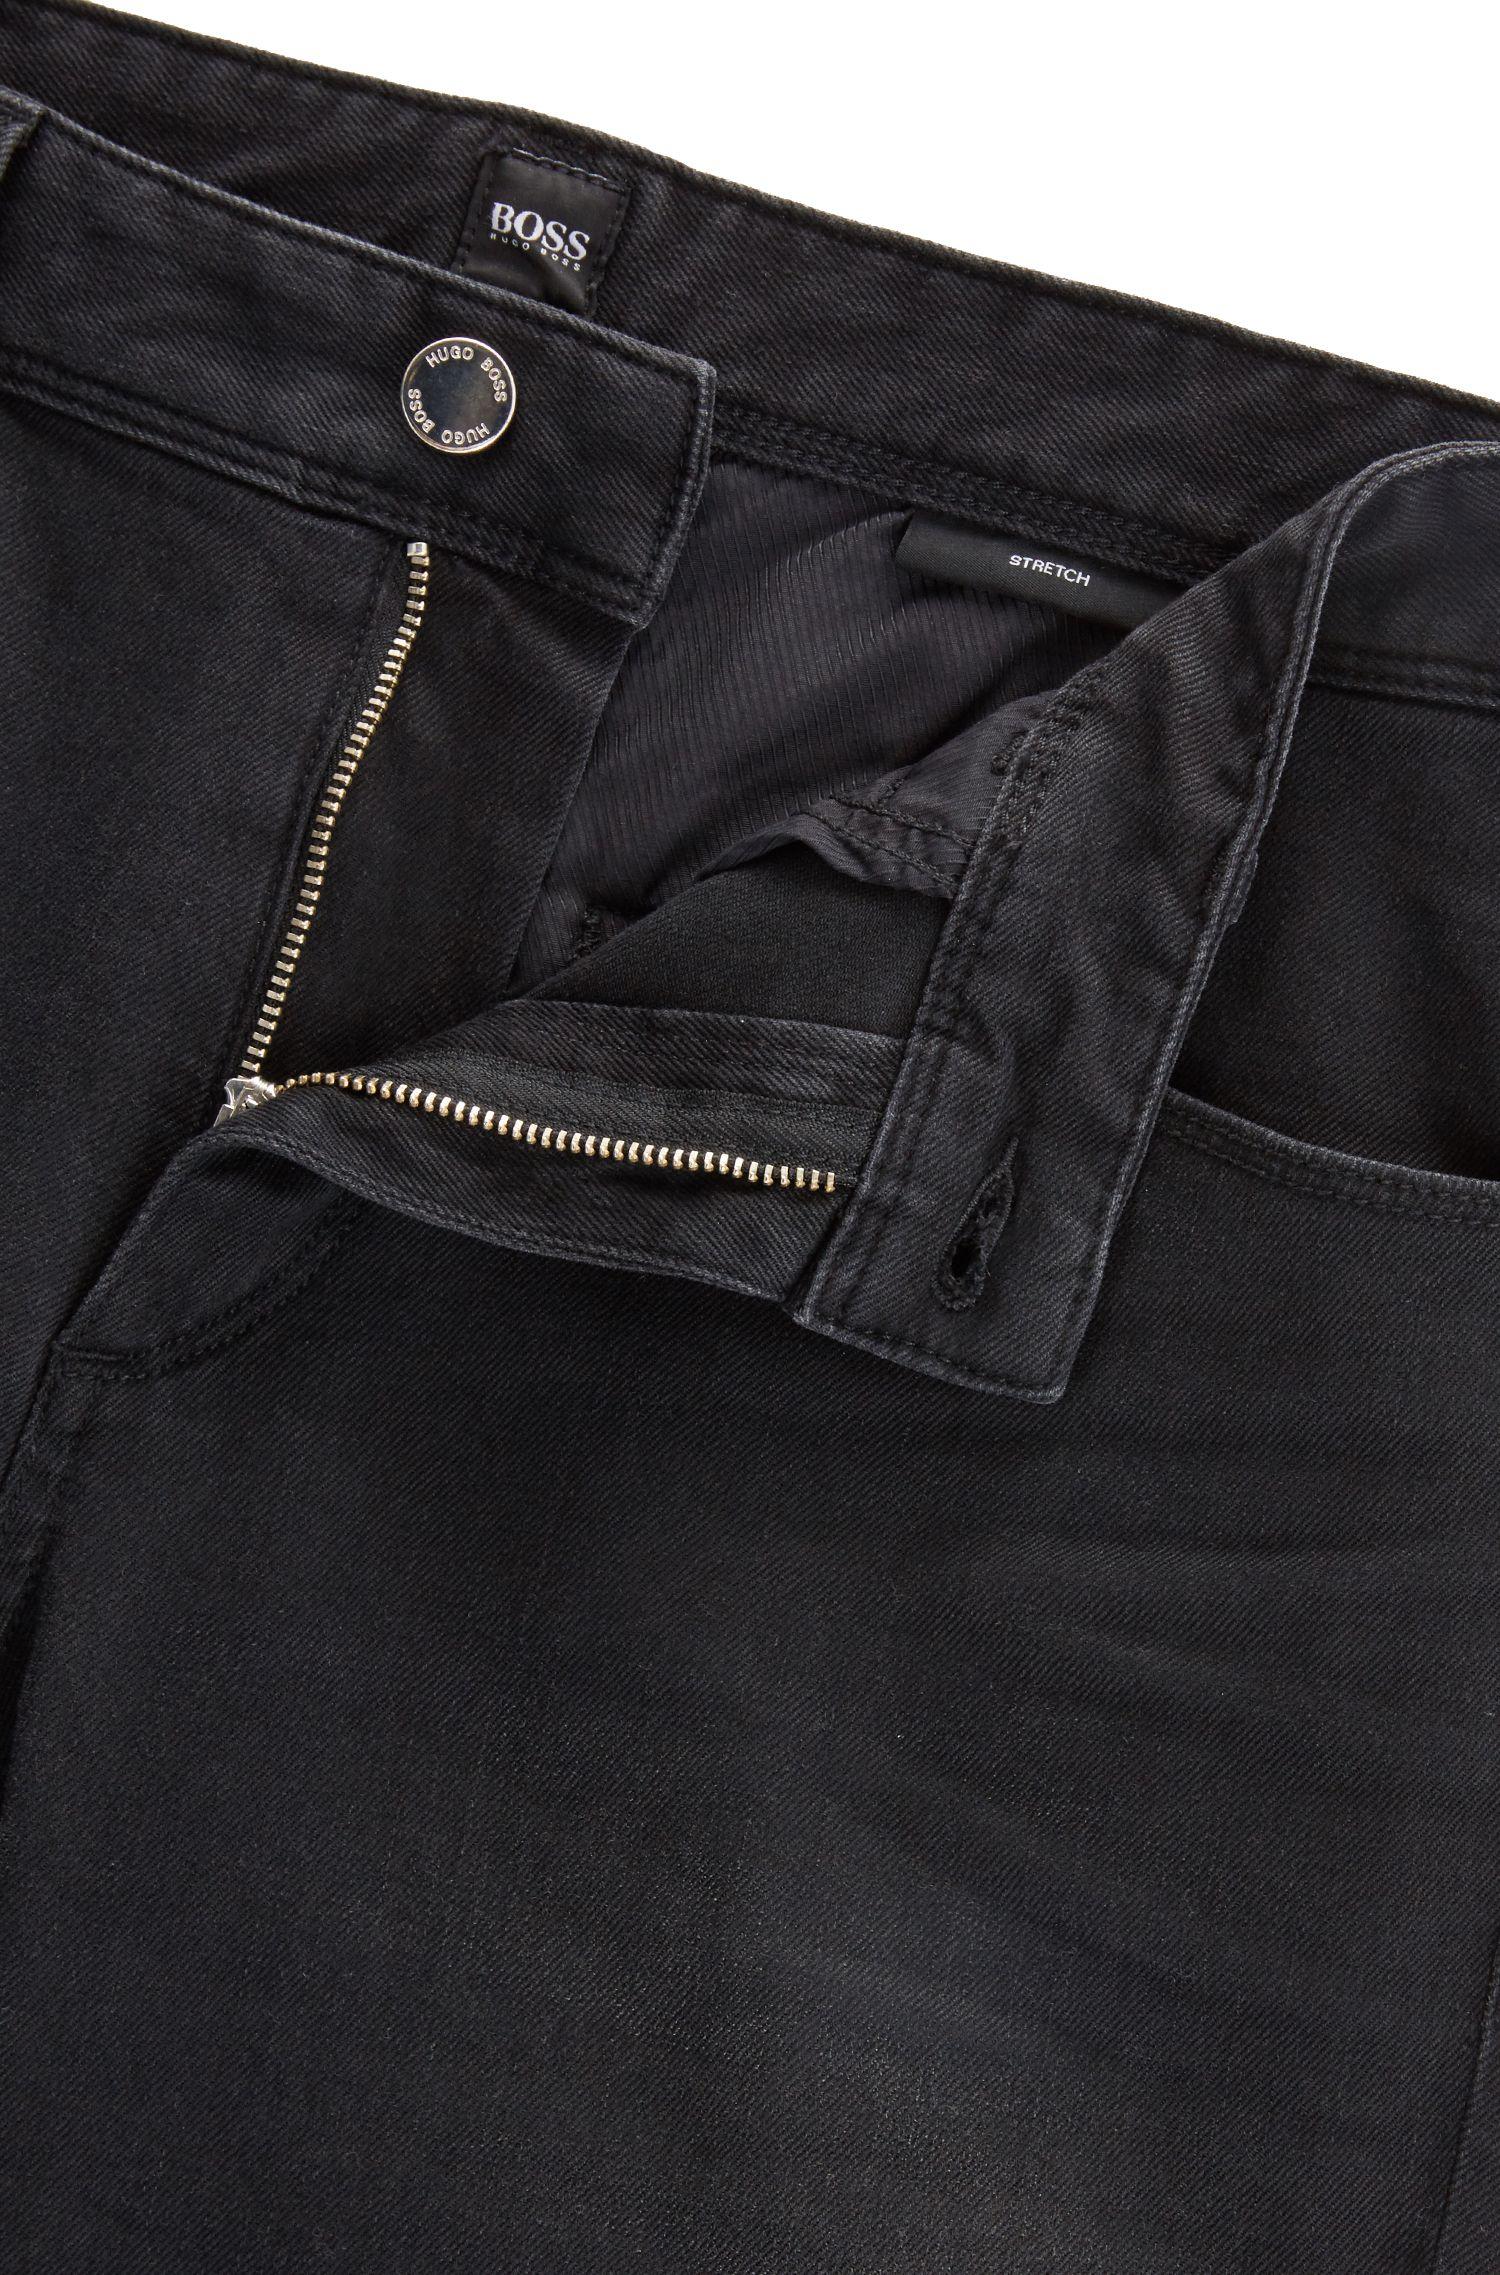 Mercedes-Benz Stretch Cotton Jean, Slim Fit   Delaware